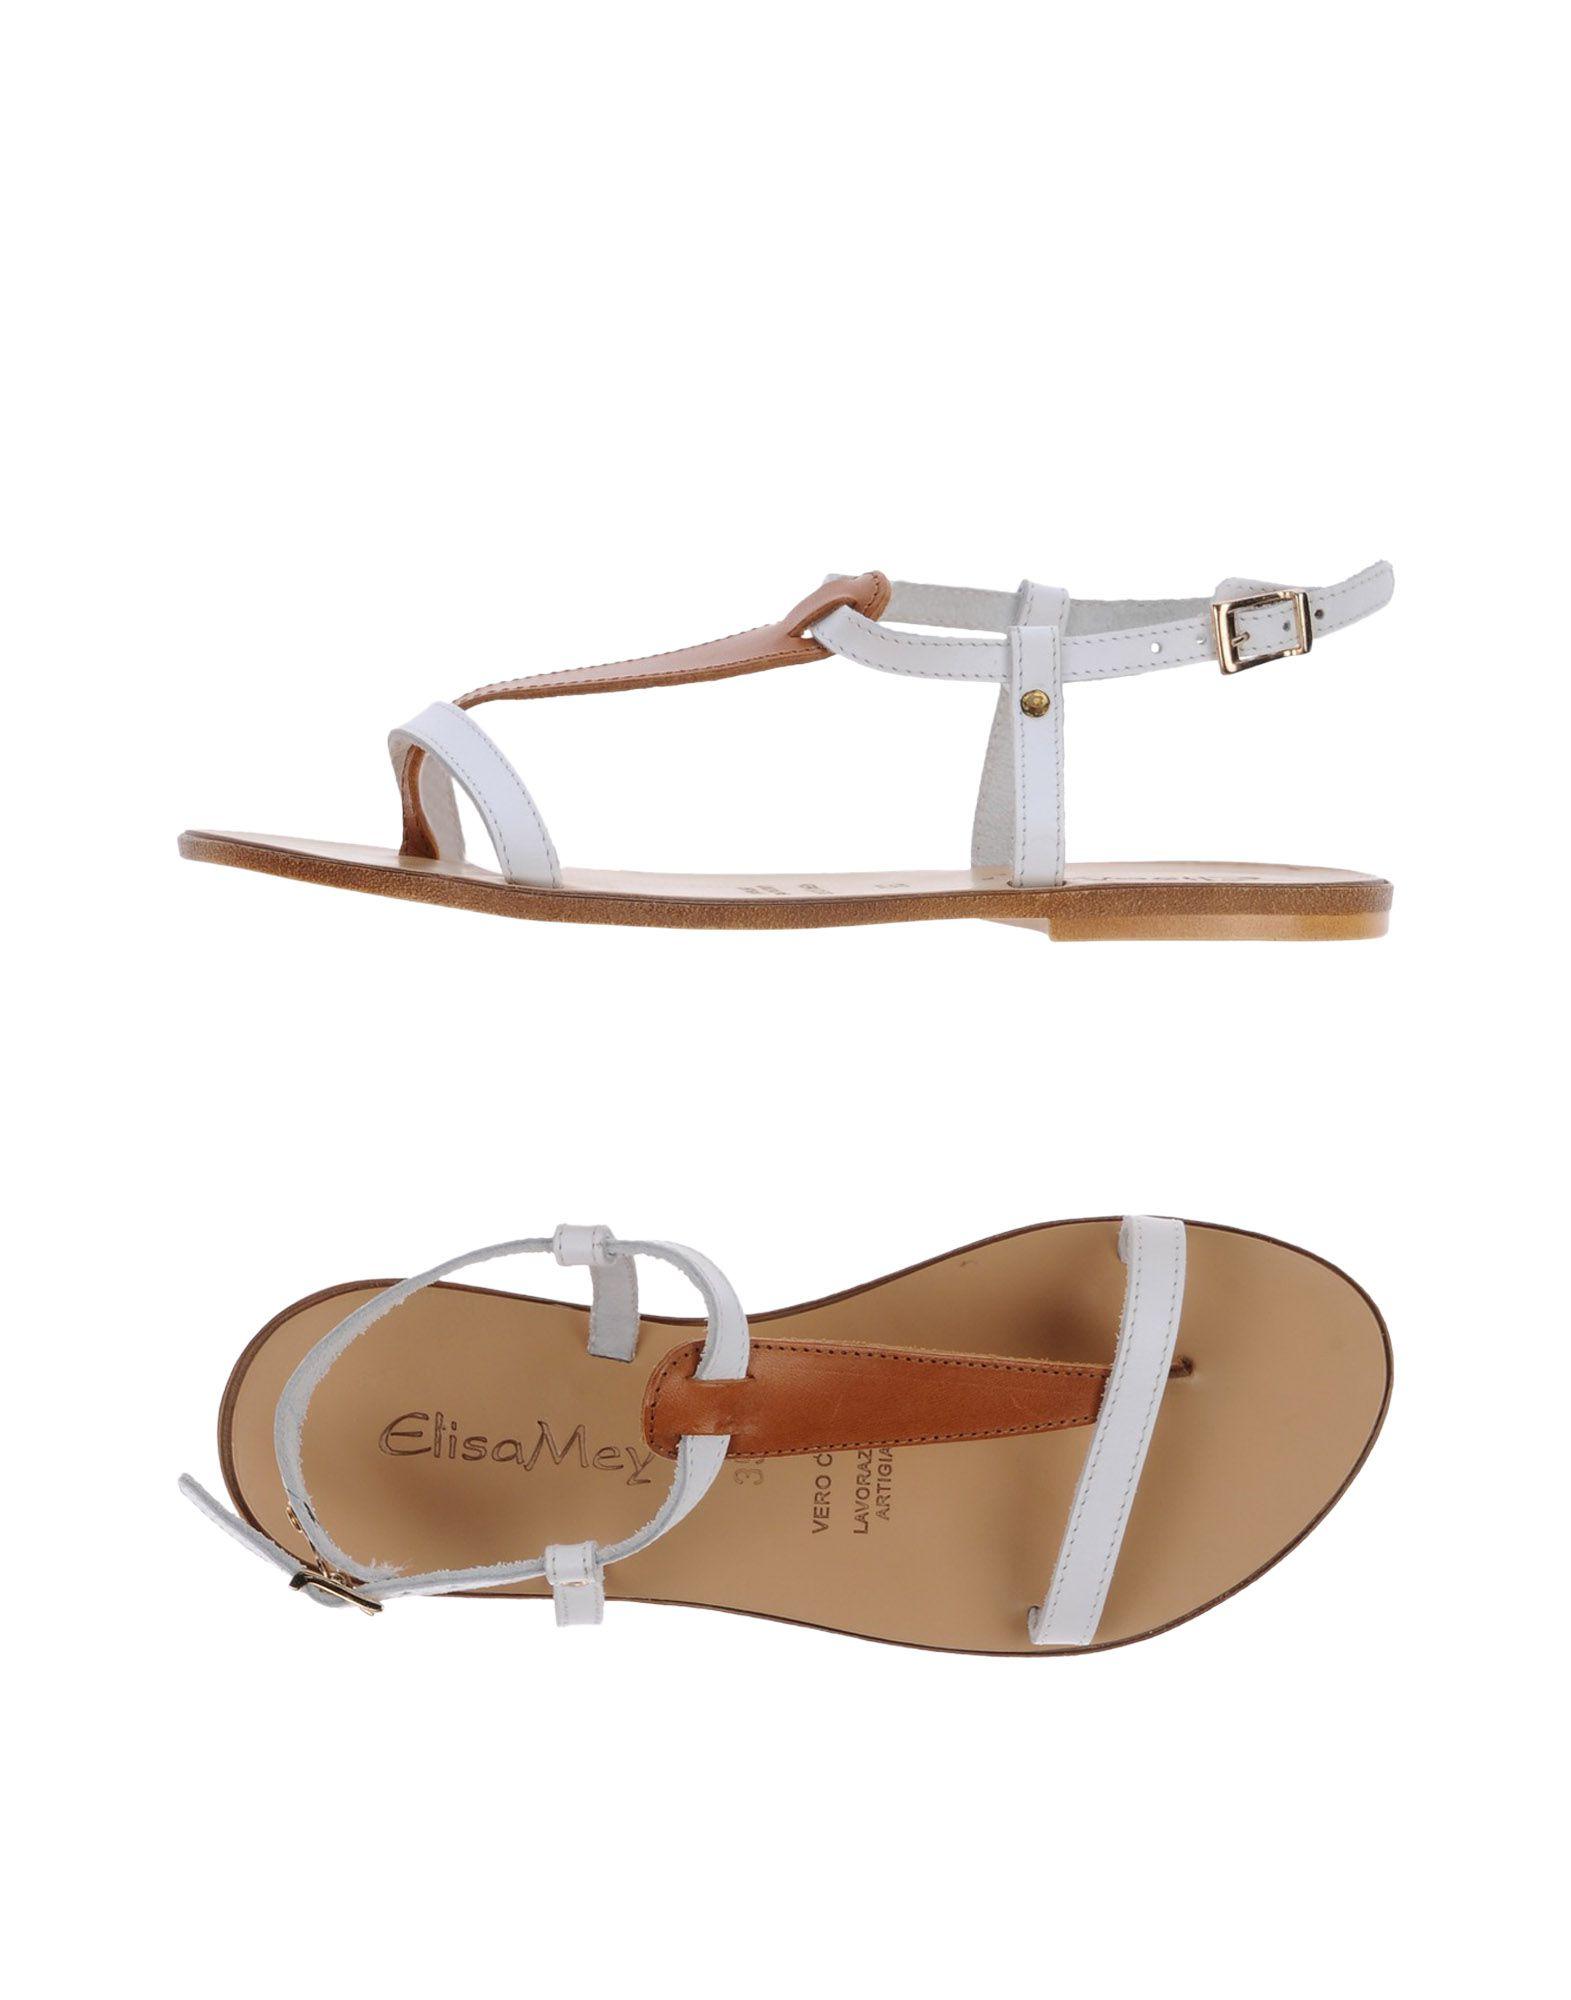 Elisa Mey® Flip Flops - Women Elisa Mey®  Flip Flops online on  Mey® Australia - 11431417RA 0e5e57